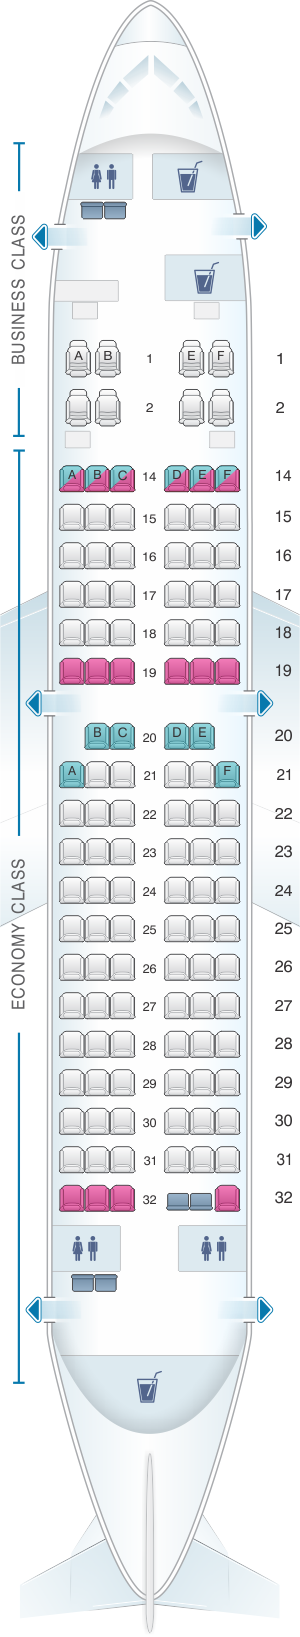 Seat map for Fiji Airways Boeing B737 700